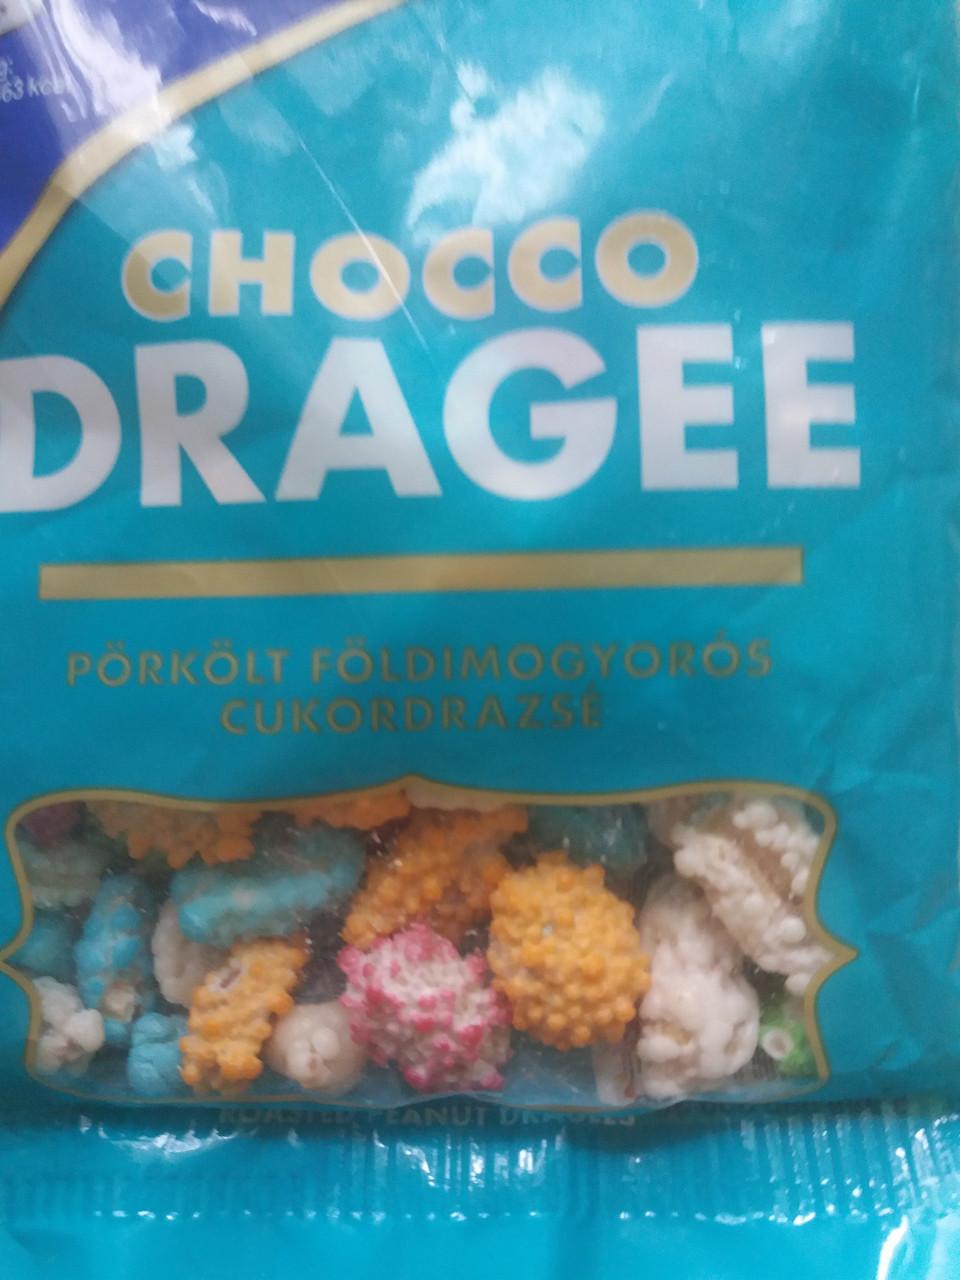 Chocco Garden-dragee жареный арахис (100г)Венгрия